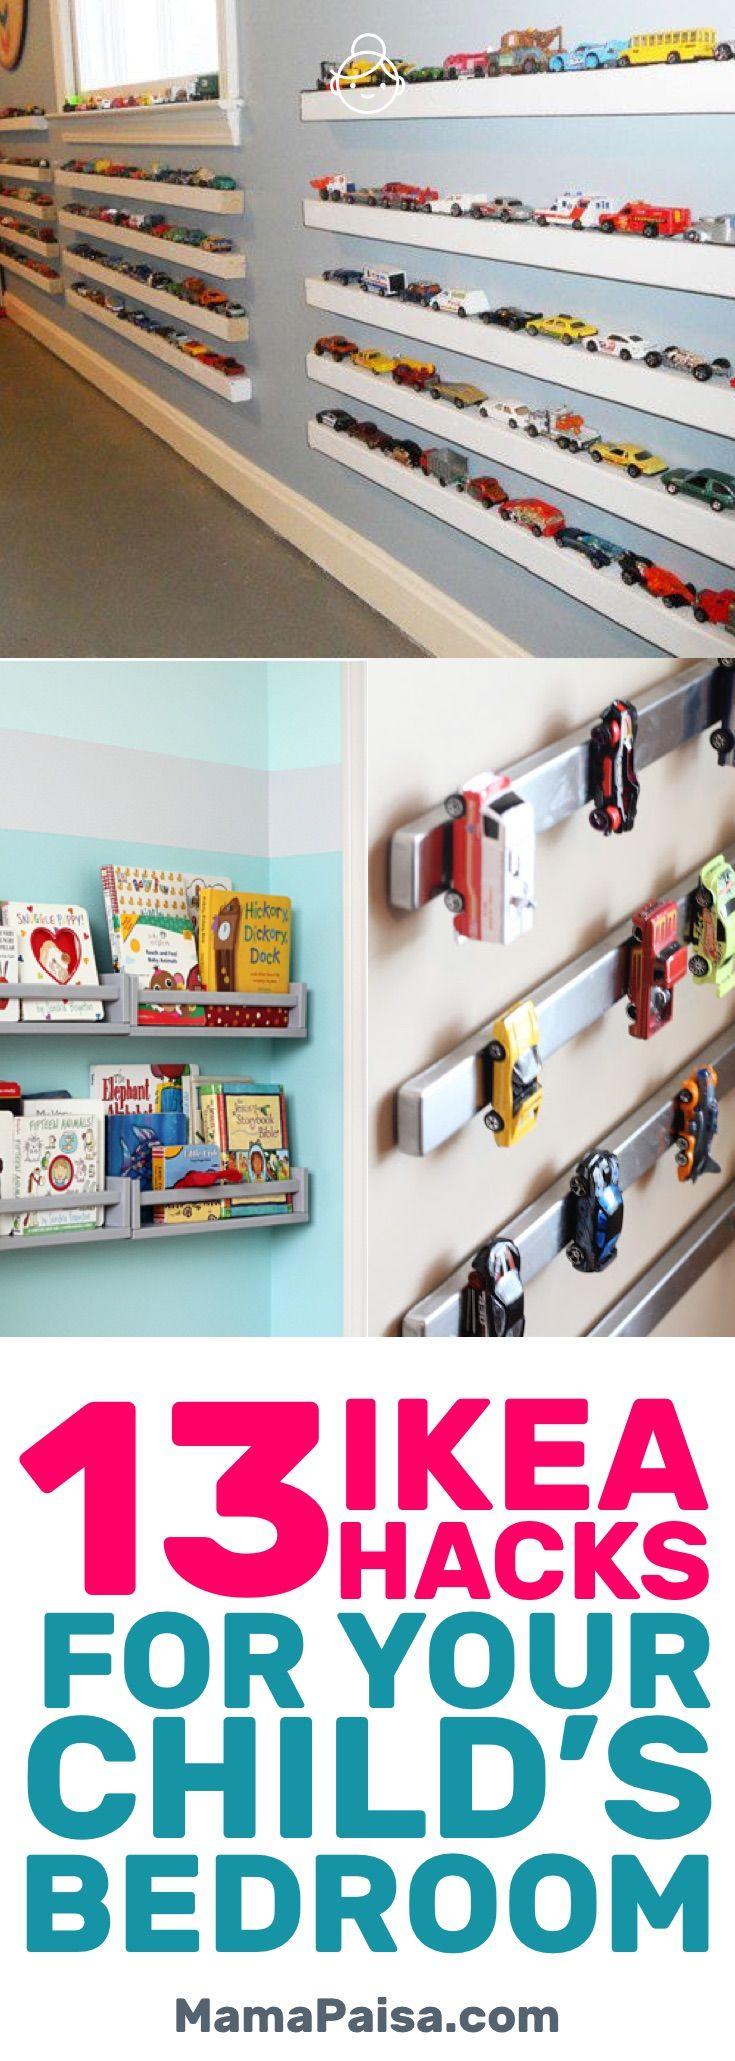 13 Simple DIY IKEA Hacks for Any Kids' Room